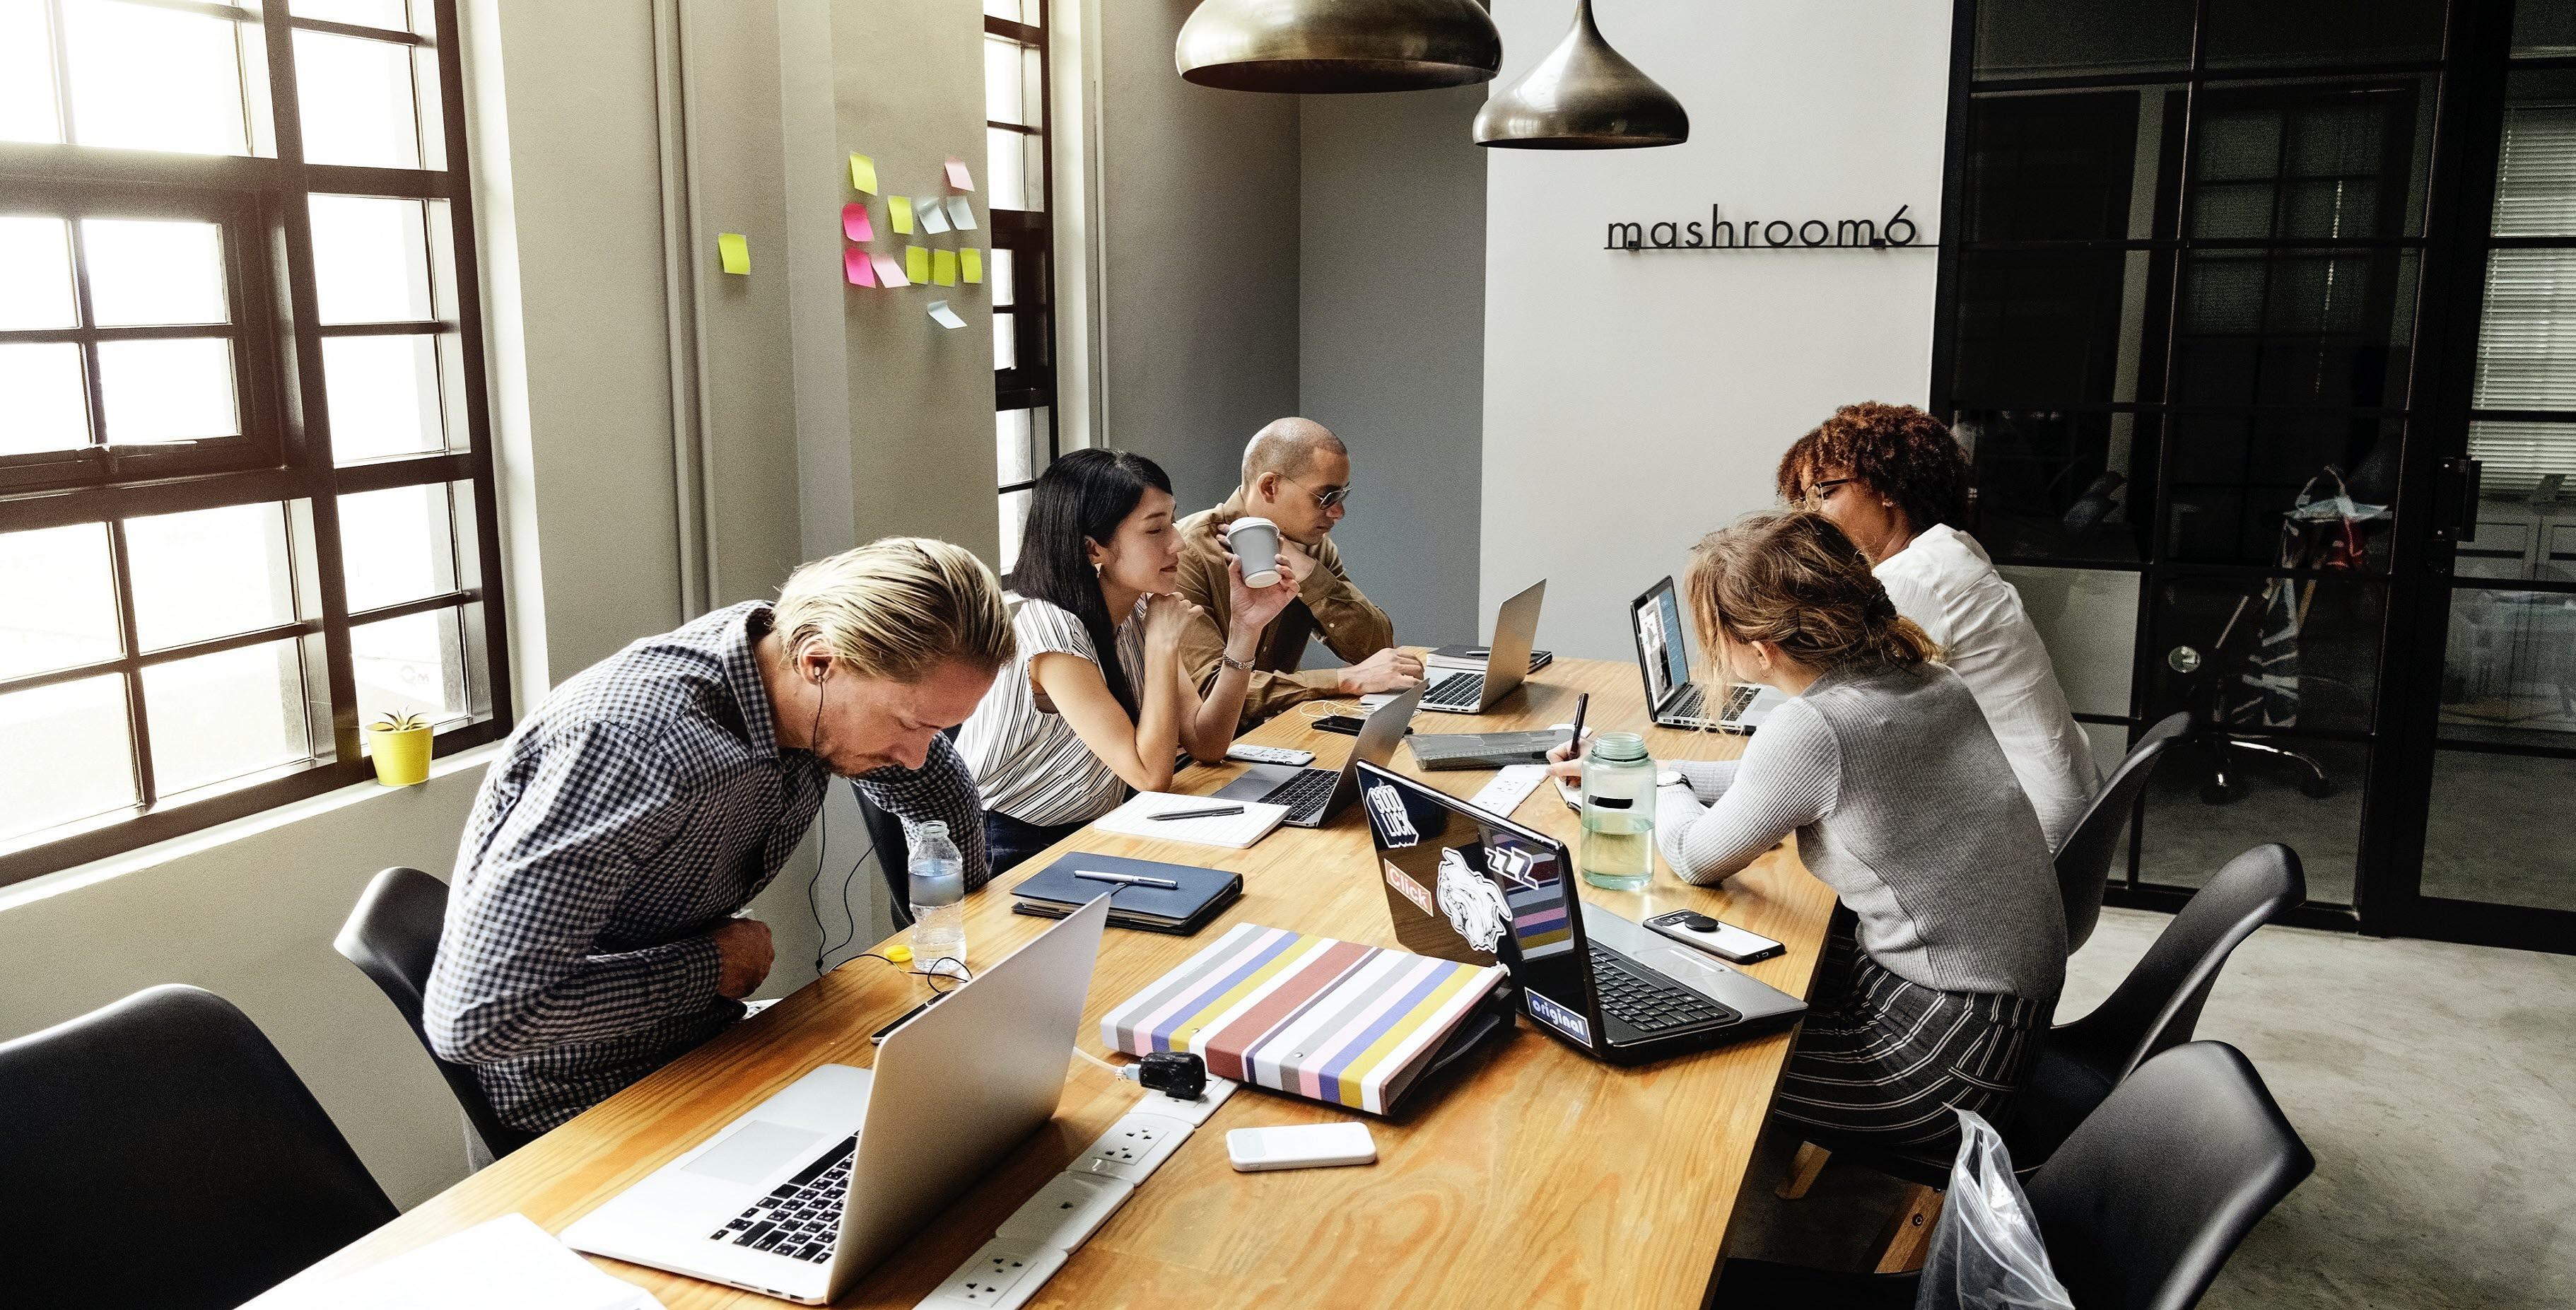 brainstorming-collaboration